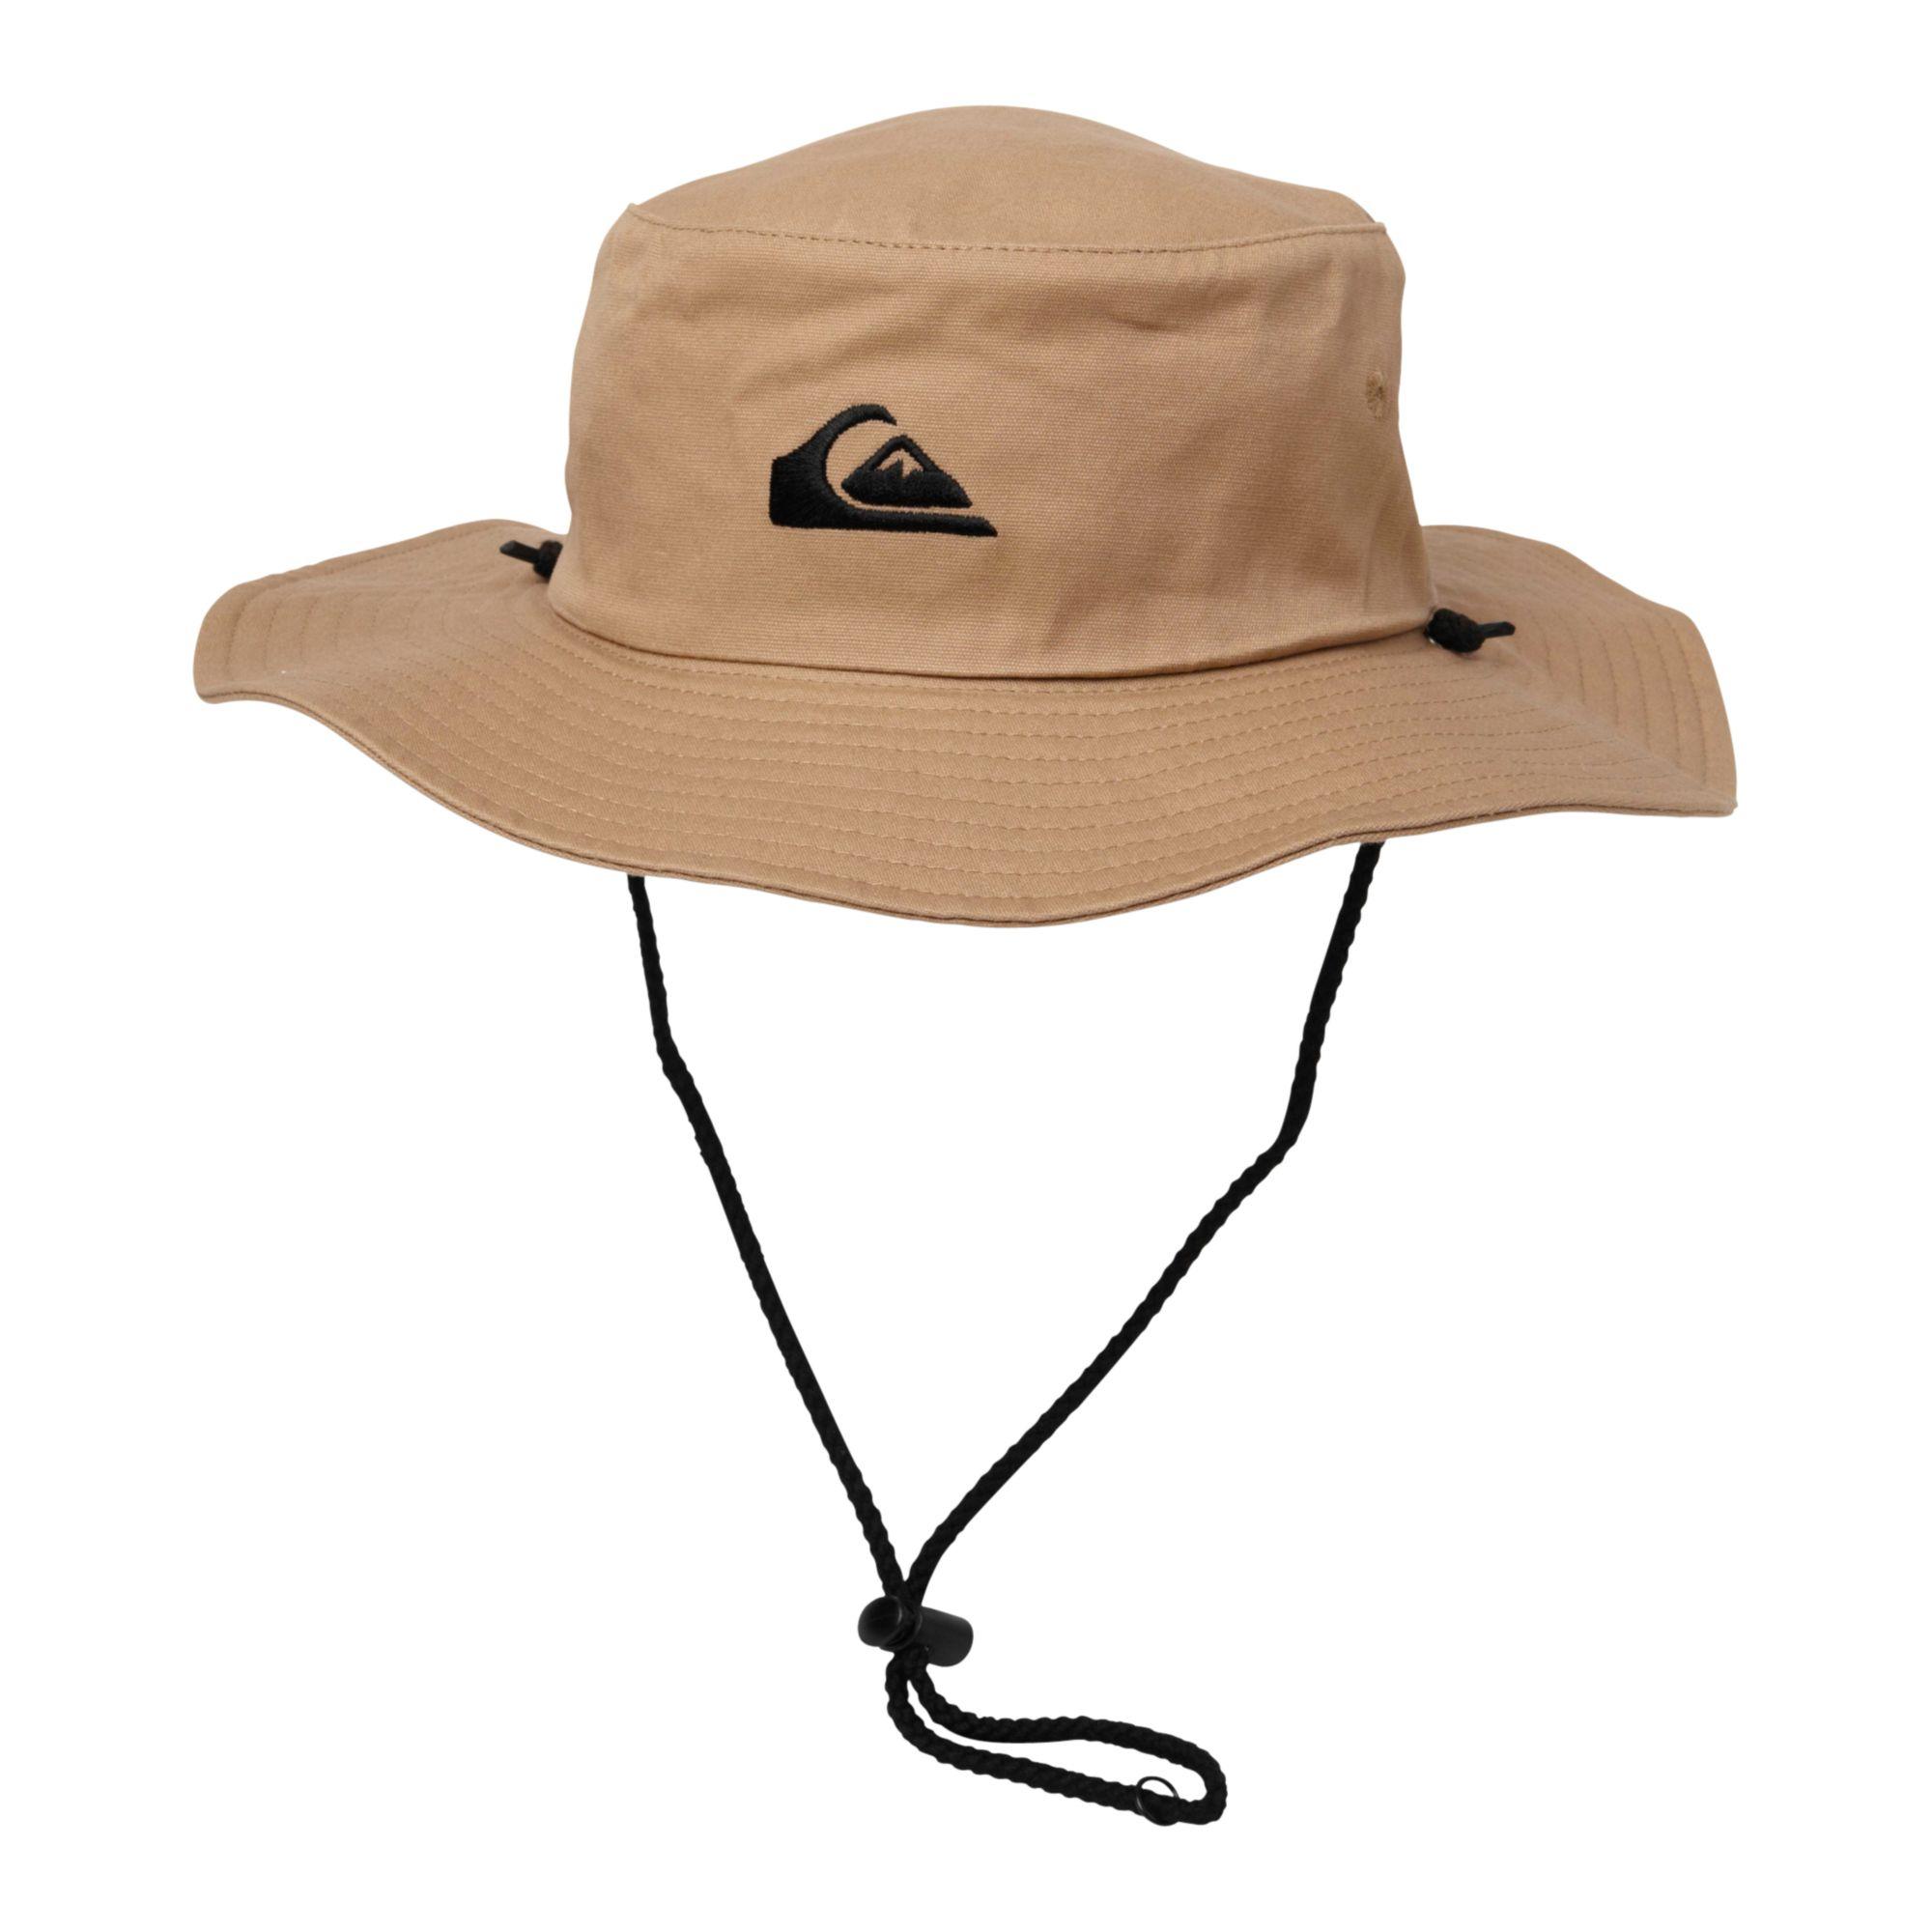 37652a964ec26 ... 50% off lyst quiksilver bushmaster hat in natural for men 4d2b6 f767a